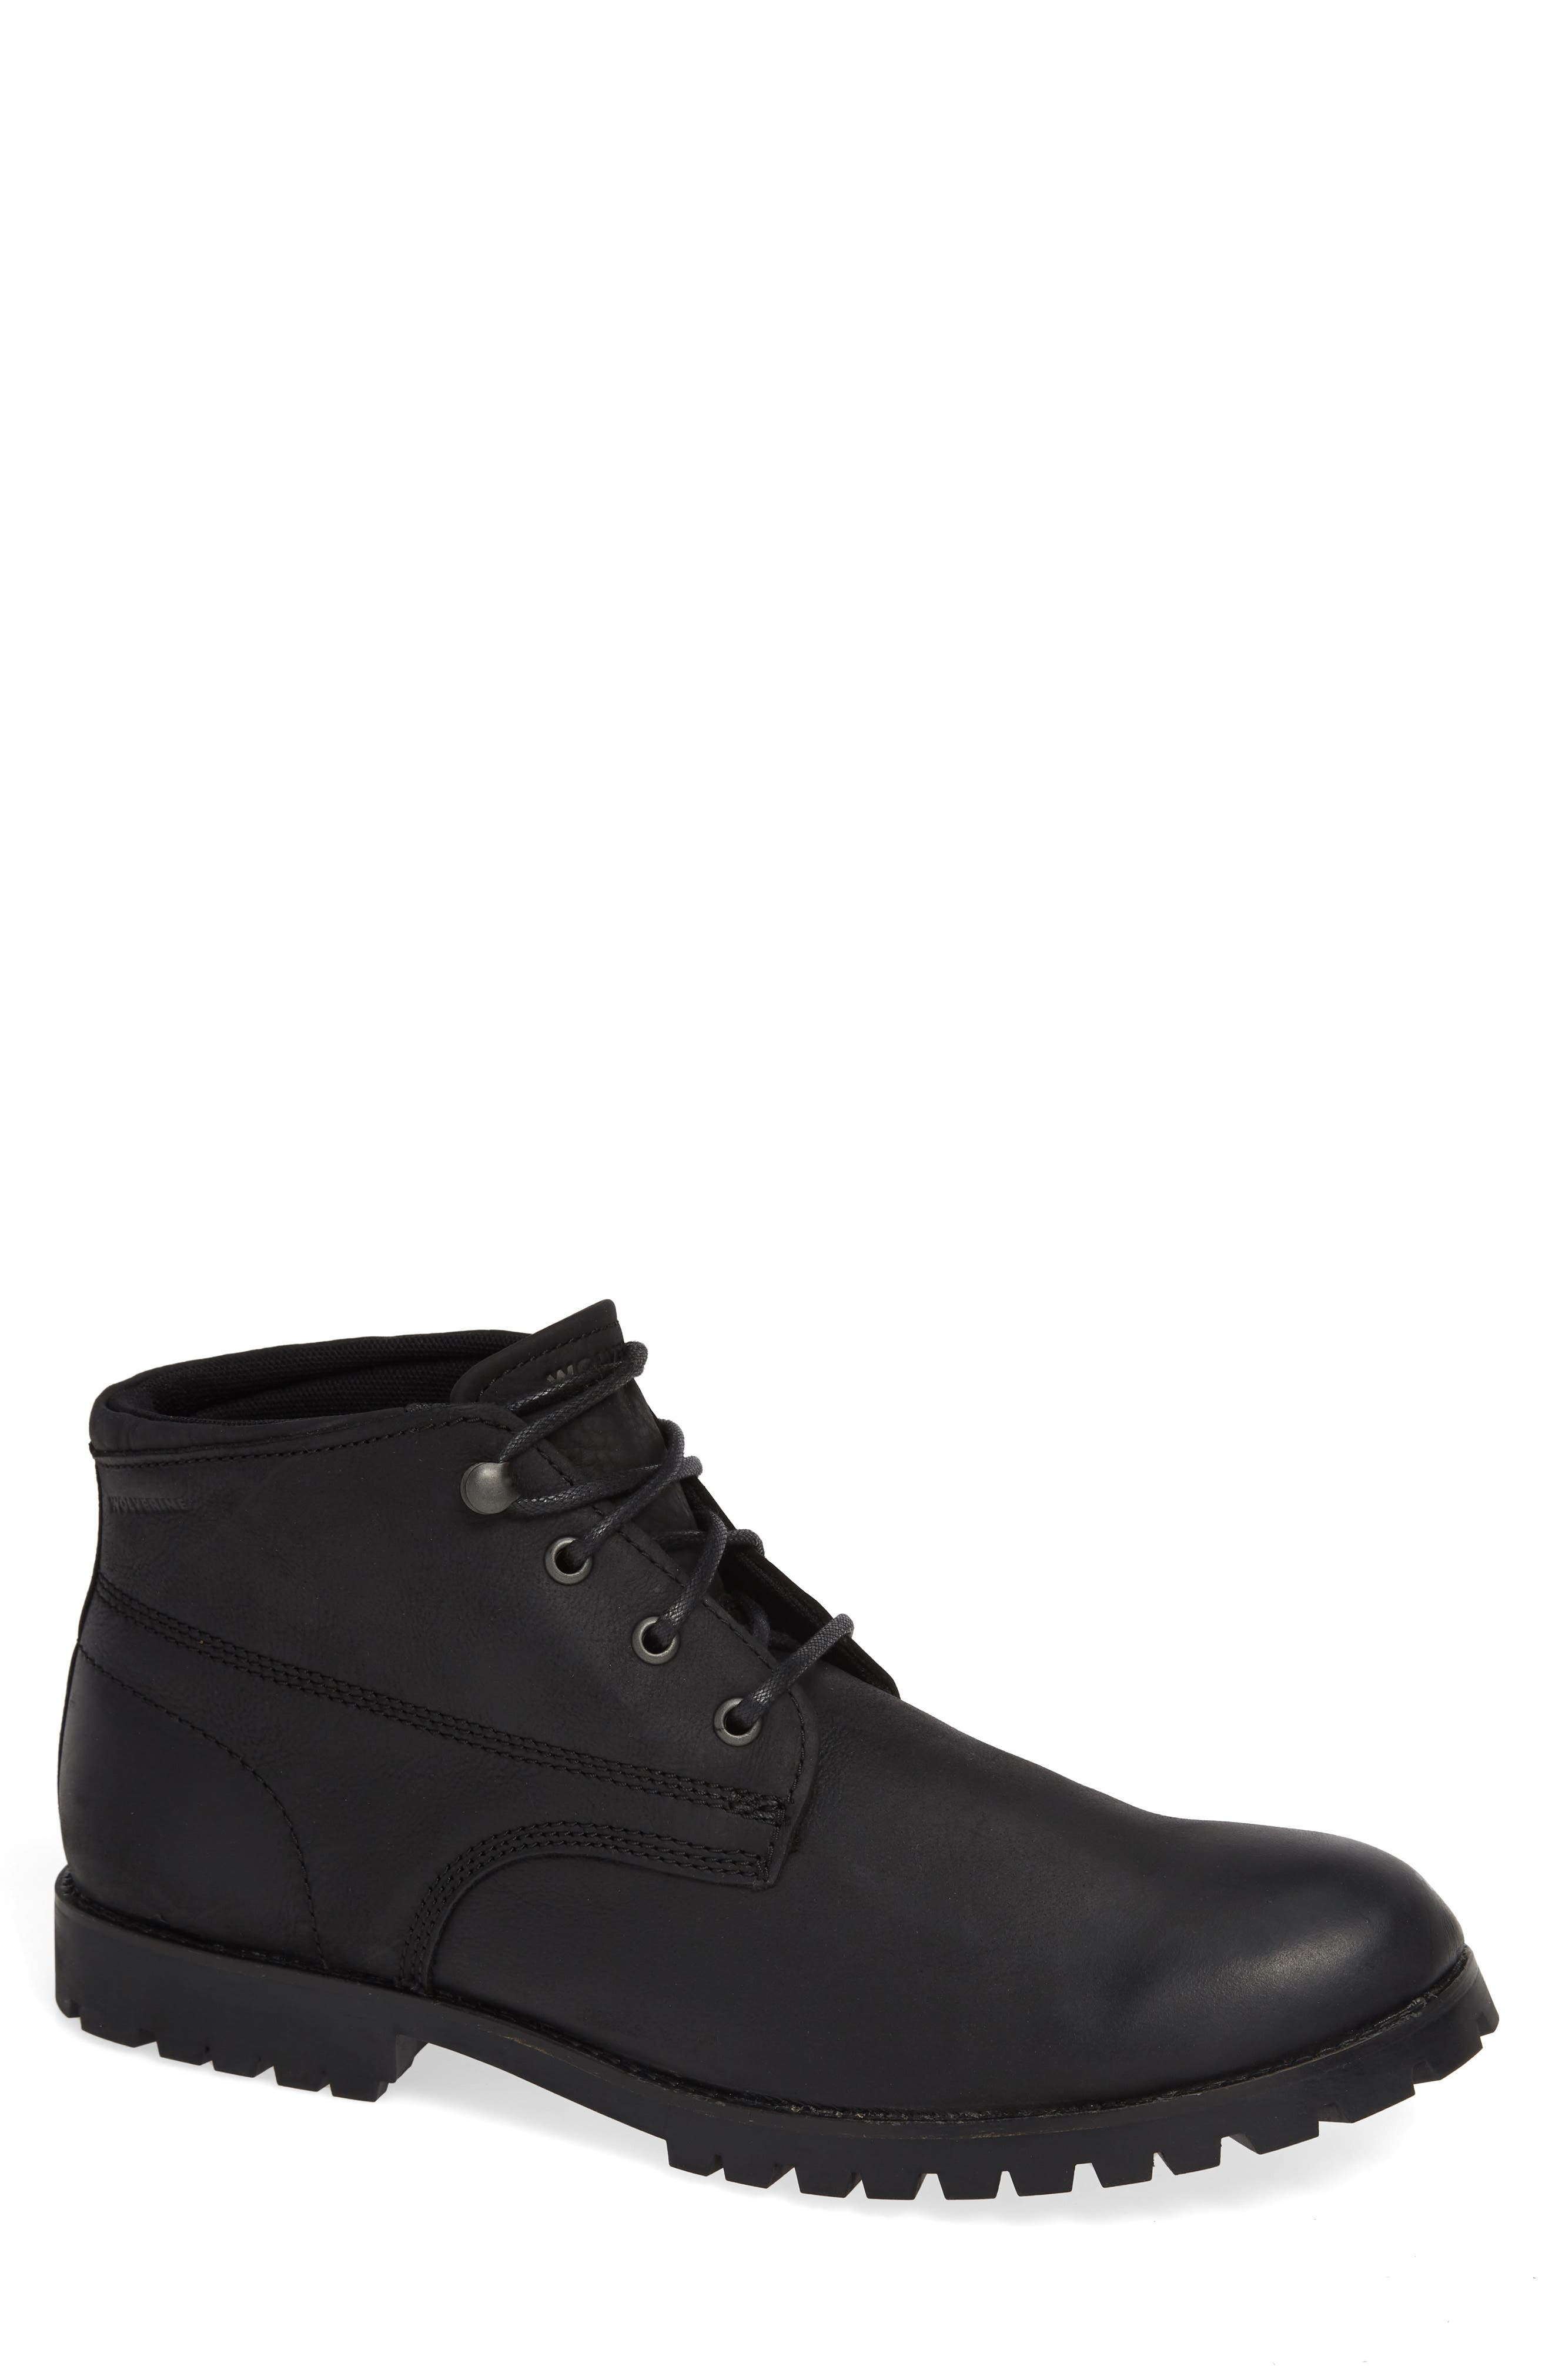 WOLVERINE,                             Cort Plain Toe Waterproof Boot,                             Main thumbnail 1, color,                             MEDIUM BLACK